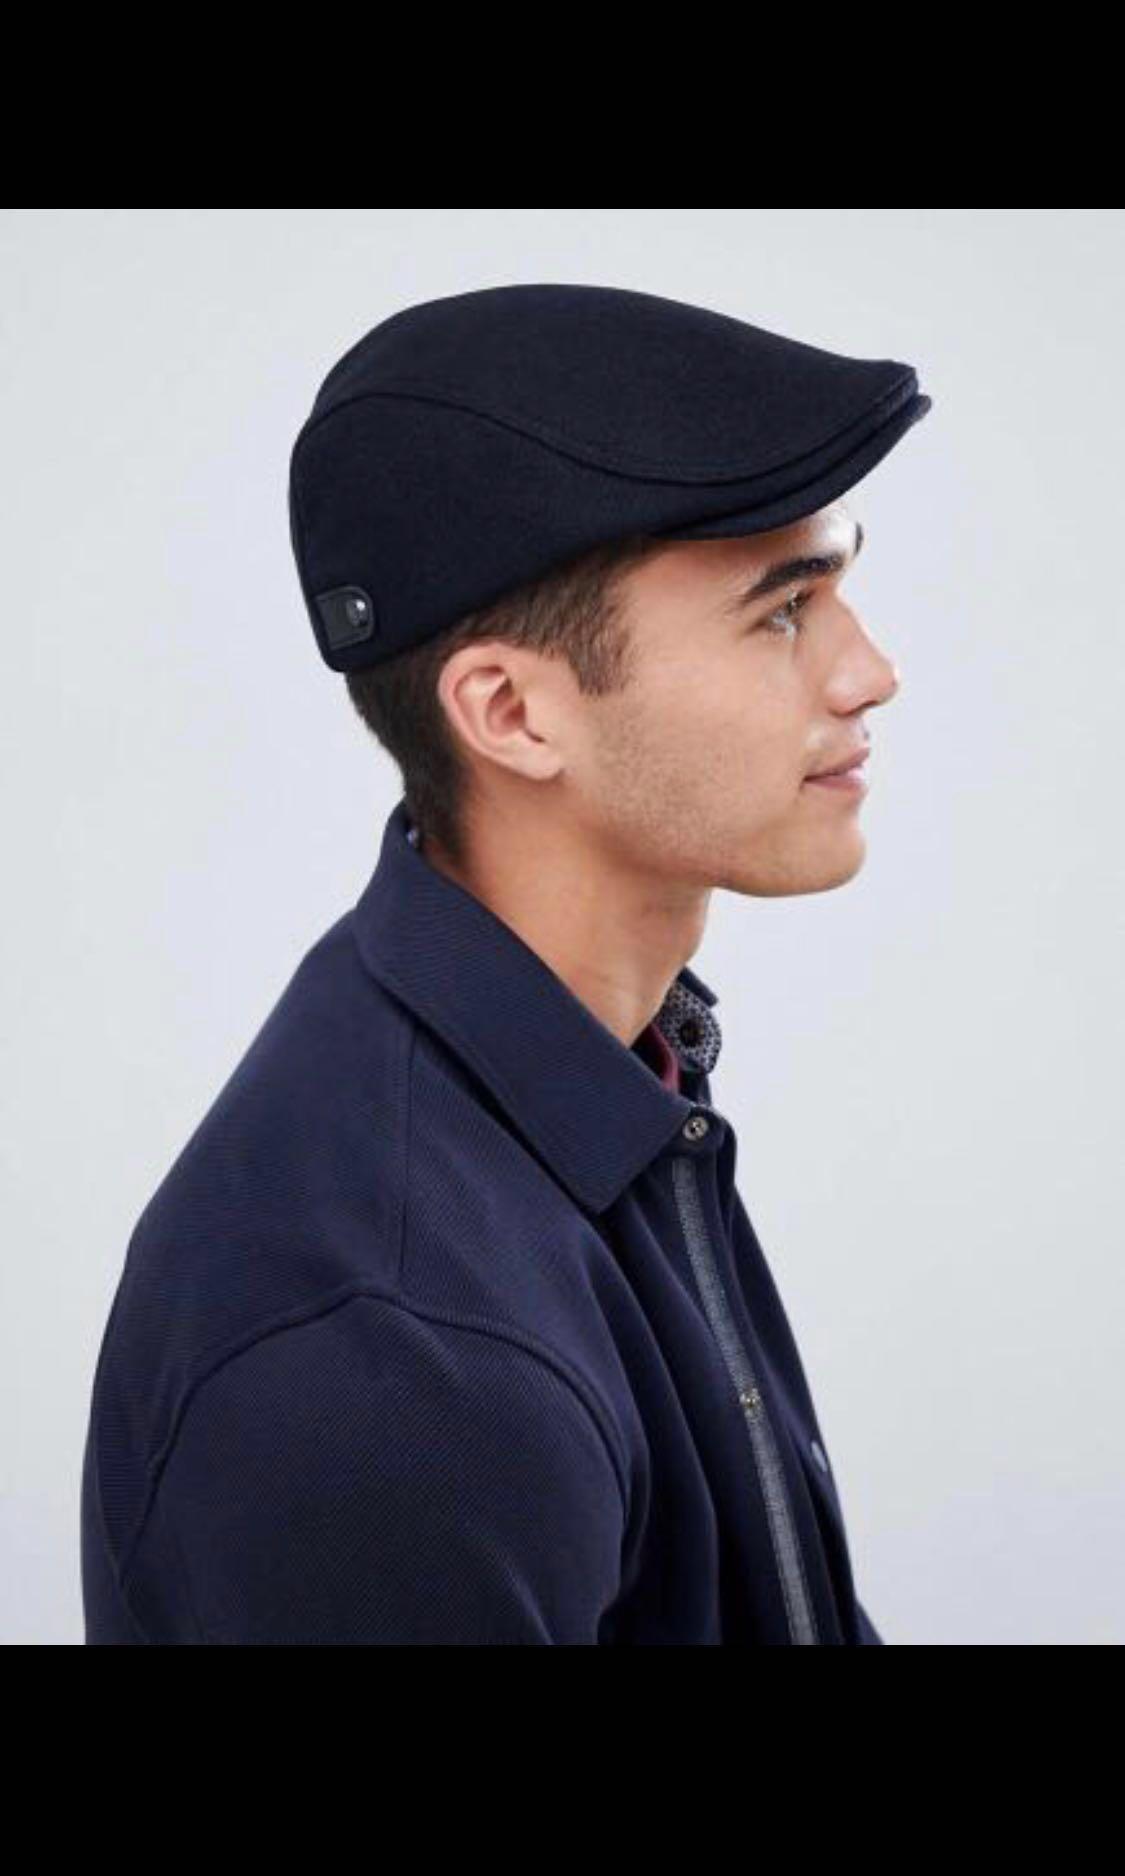 cae33928a3f853 Ted Baker English Twill Flat Cap, Men's Fashion, Accessories, Caps ...